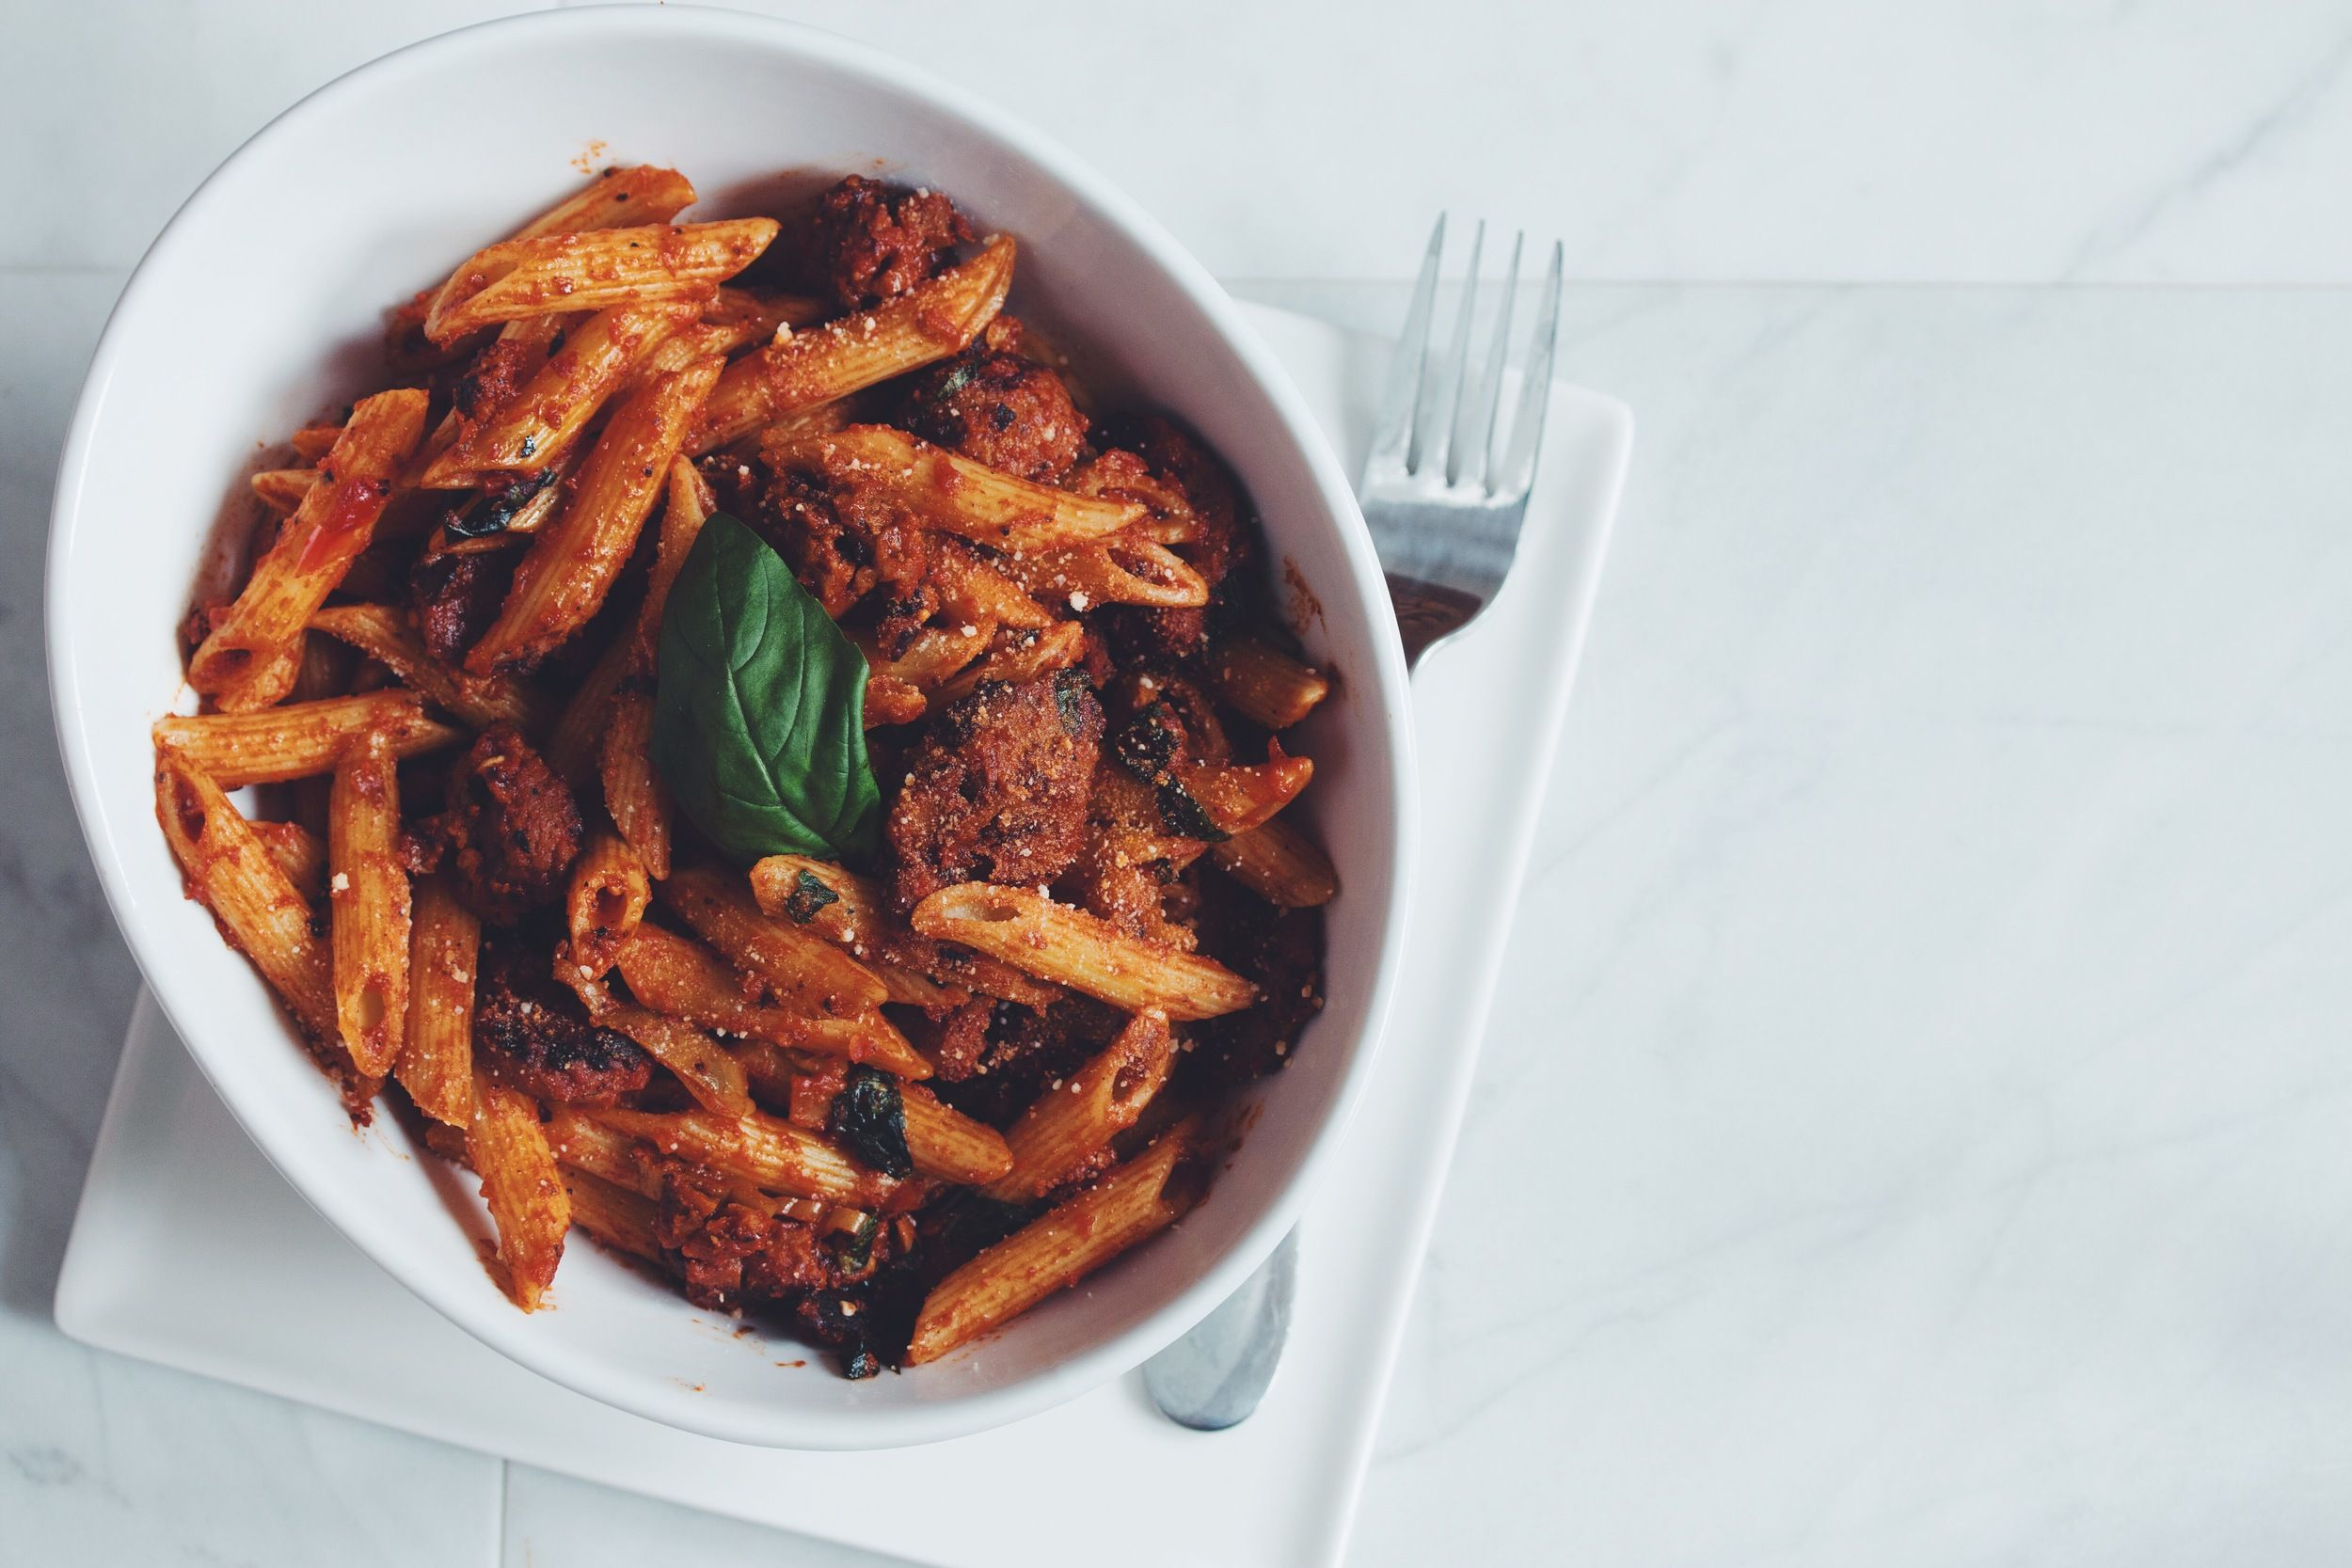 Creamy Vegan Mushroom Fettuccine Alfredo Hot For Food By Lauren Toyota Recipe Food Arrabbiata Recipes Recipes